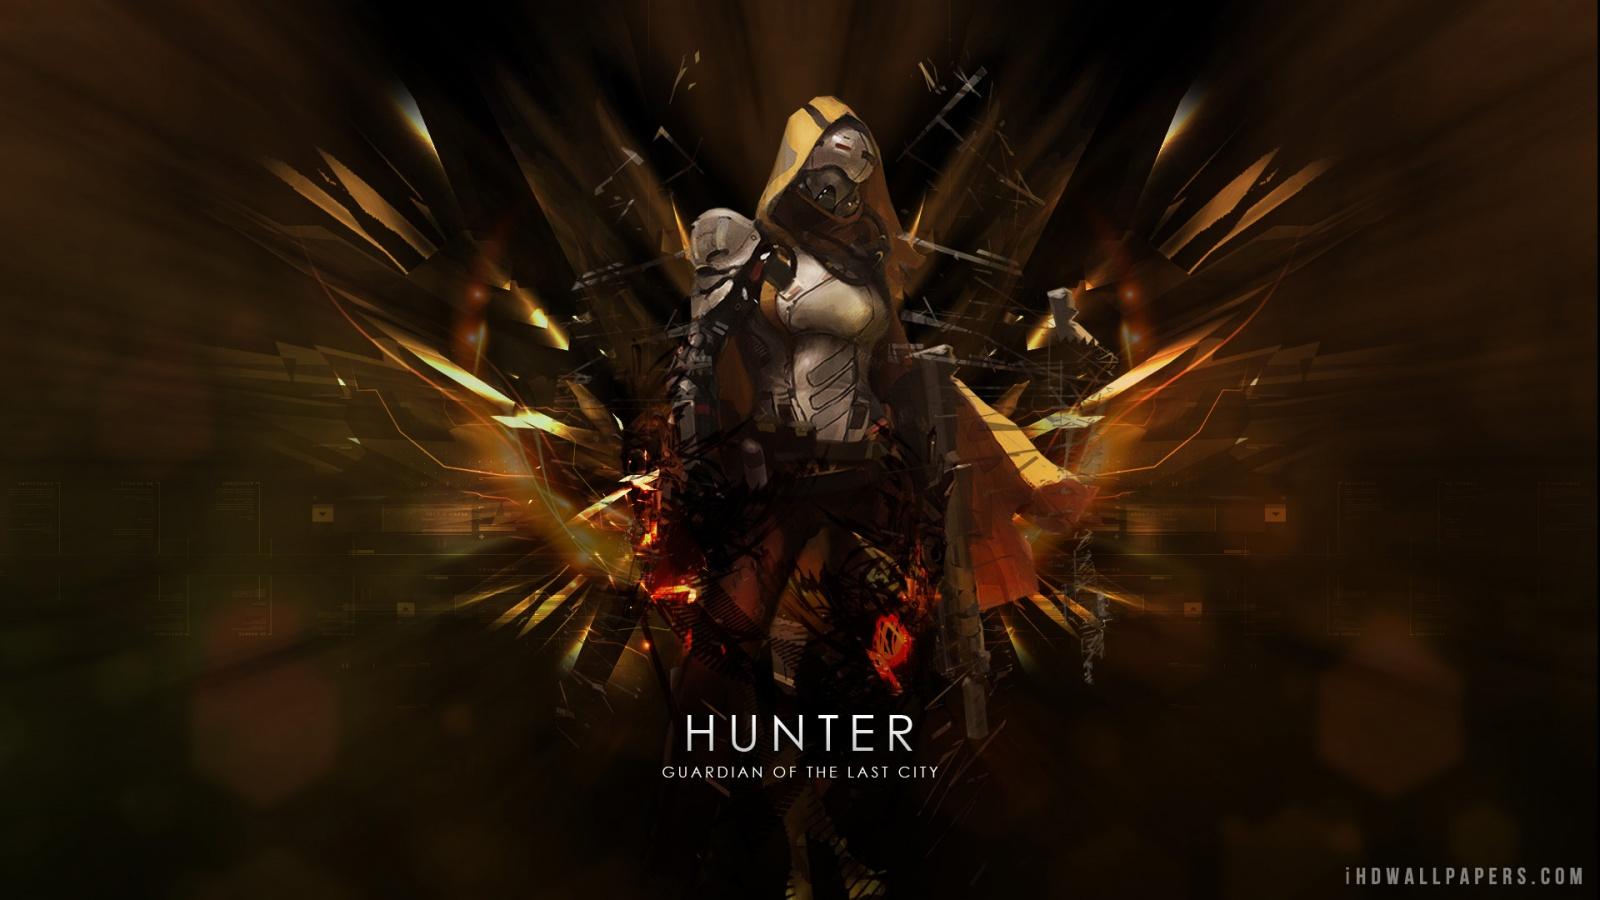 Destiny Hunter Wallpaper Pictures 1600x900